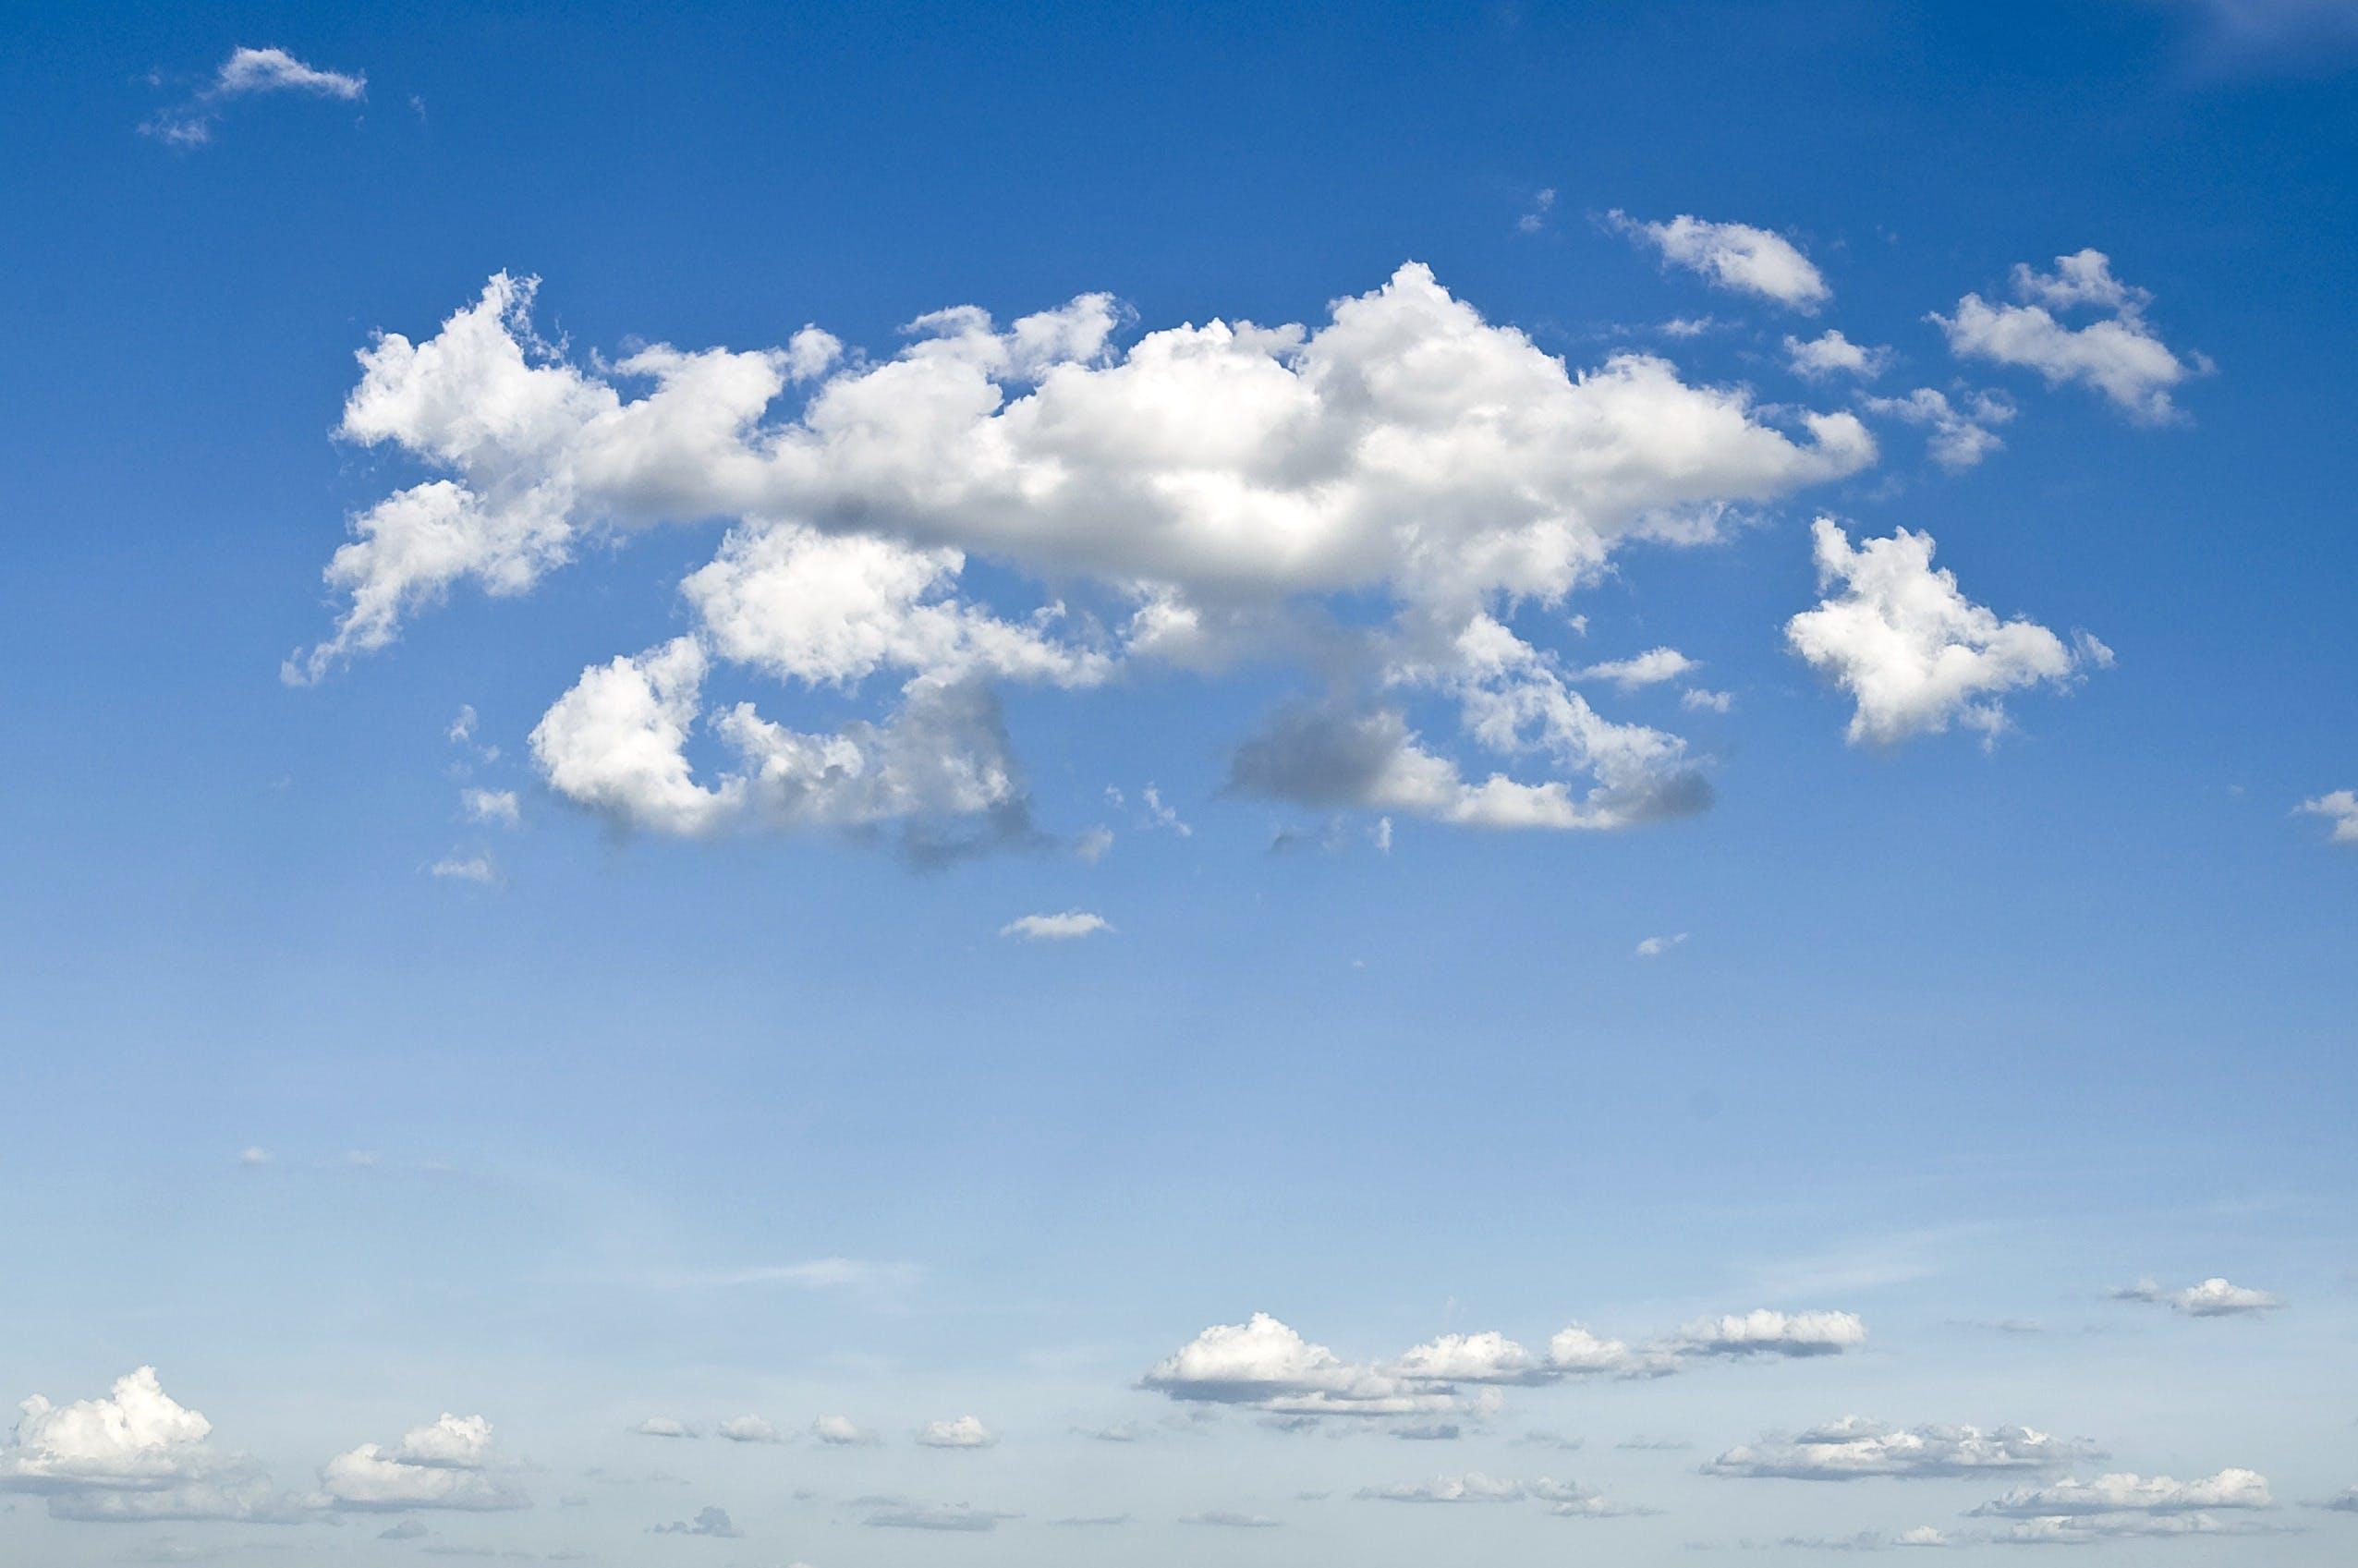 Kostenloses Stock Foto zu hd wallpaper, himmel, natur, wolken